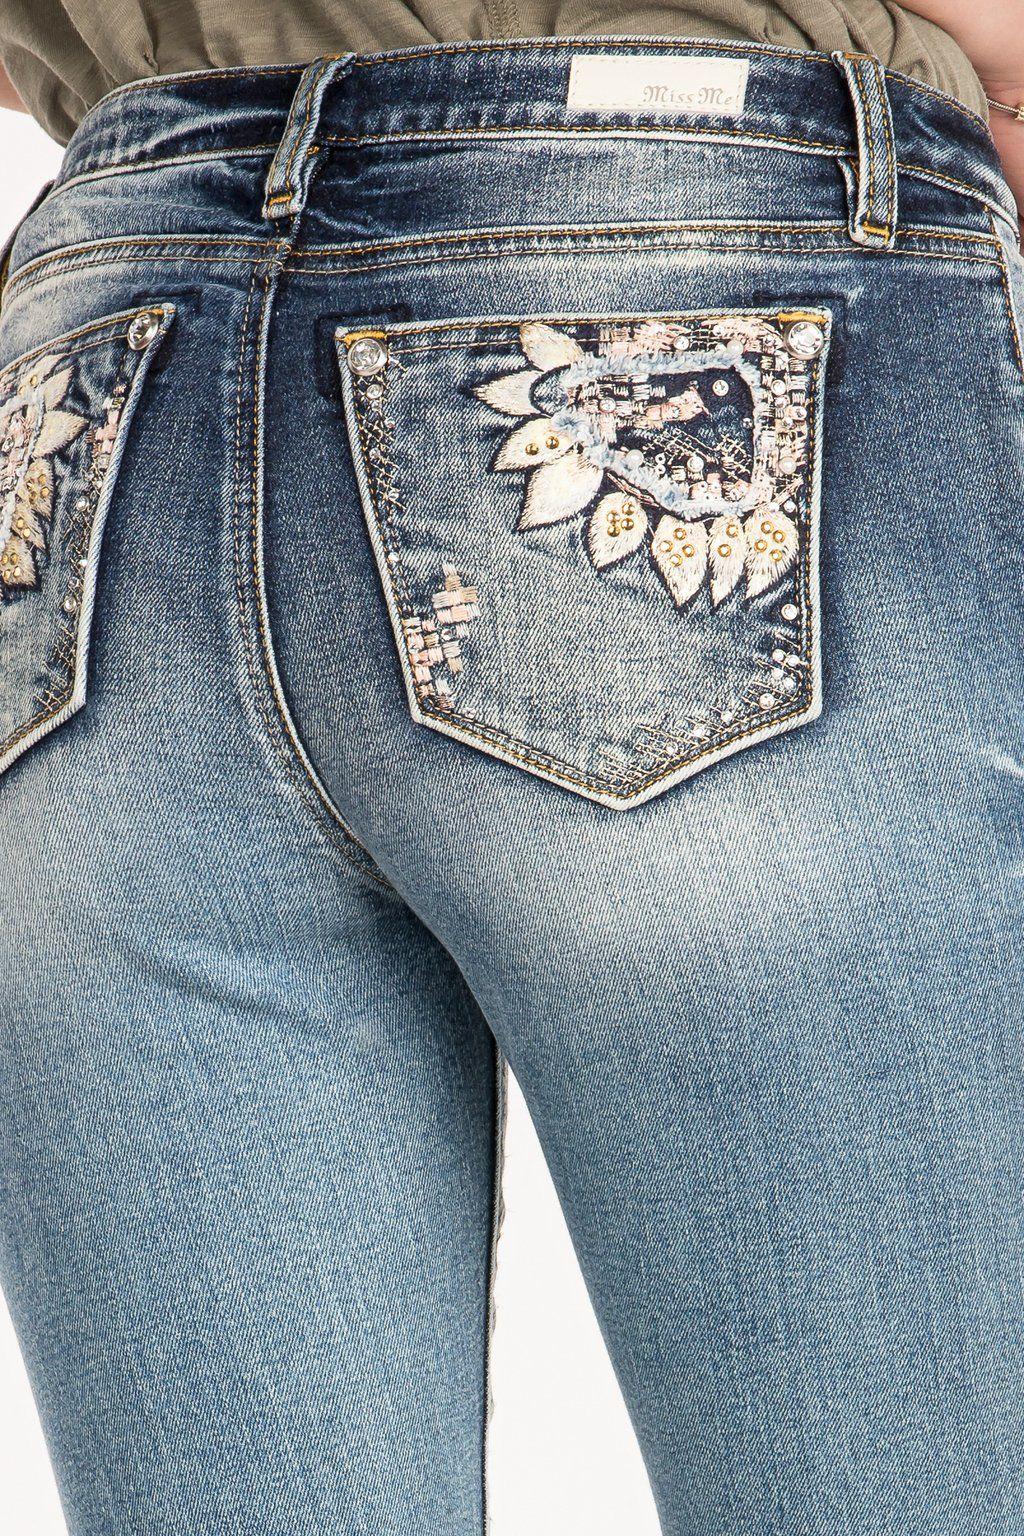 Pin On Jean Designs